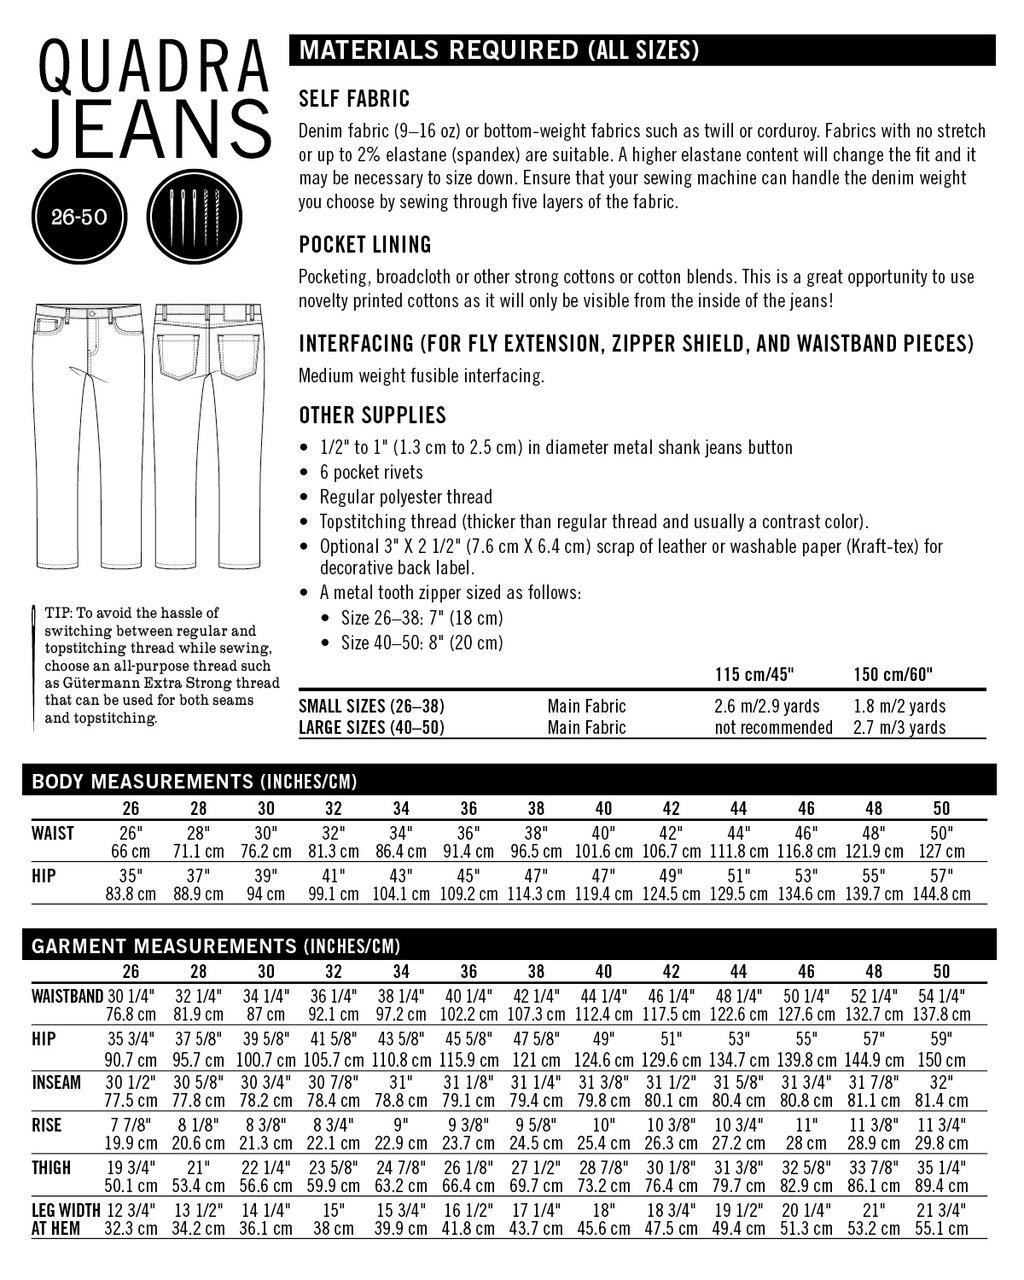 Mens Jeans Pattern : jeans, pattern, Men's, Quadra, Jeans, Foldline